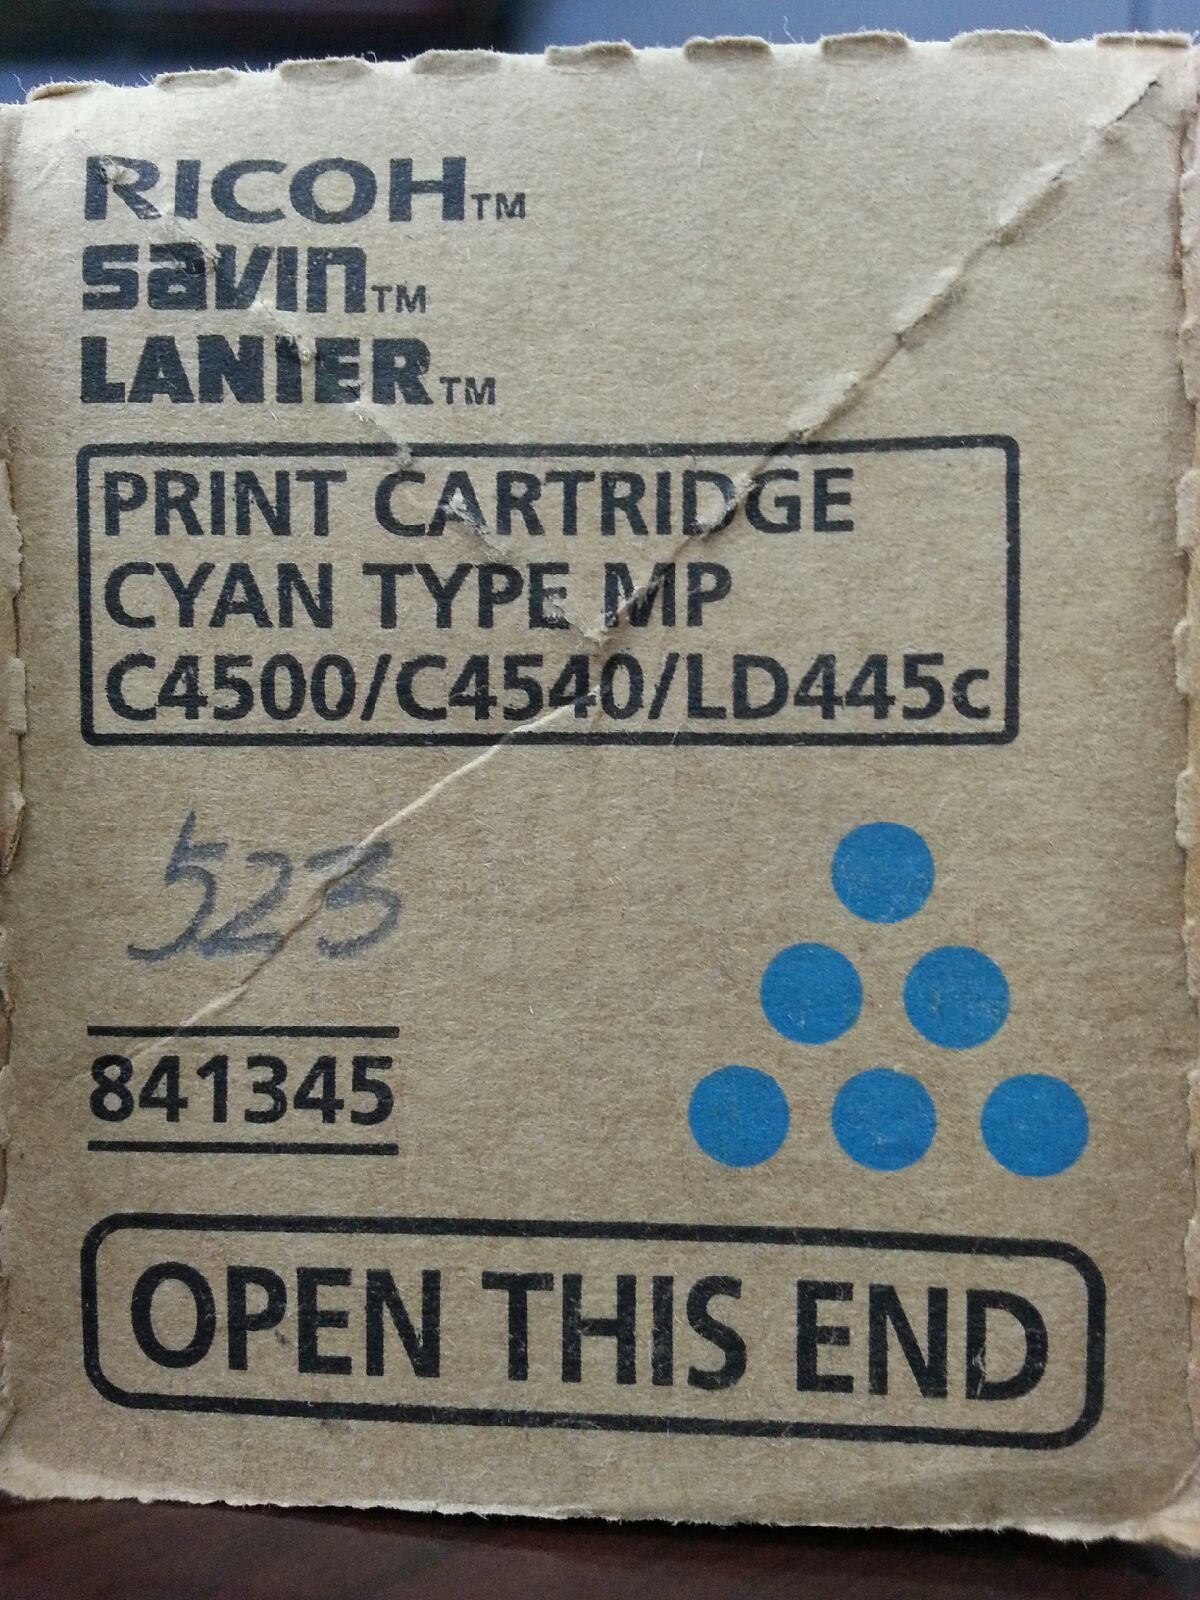 Ricoh Savin Lanier (841345) Cyan Toner for Models MP C4500, C4540, LD445c by Gestetner